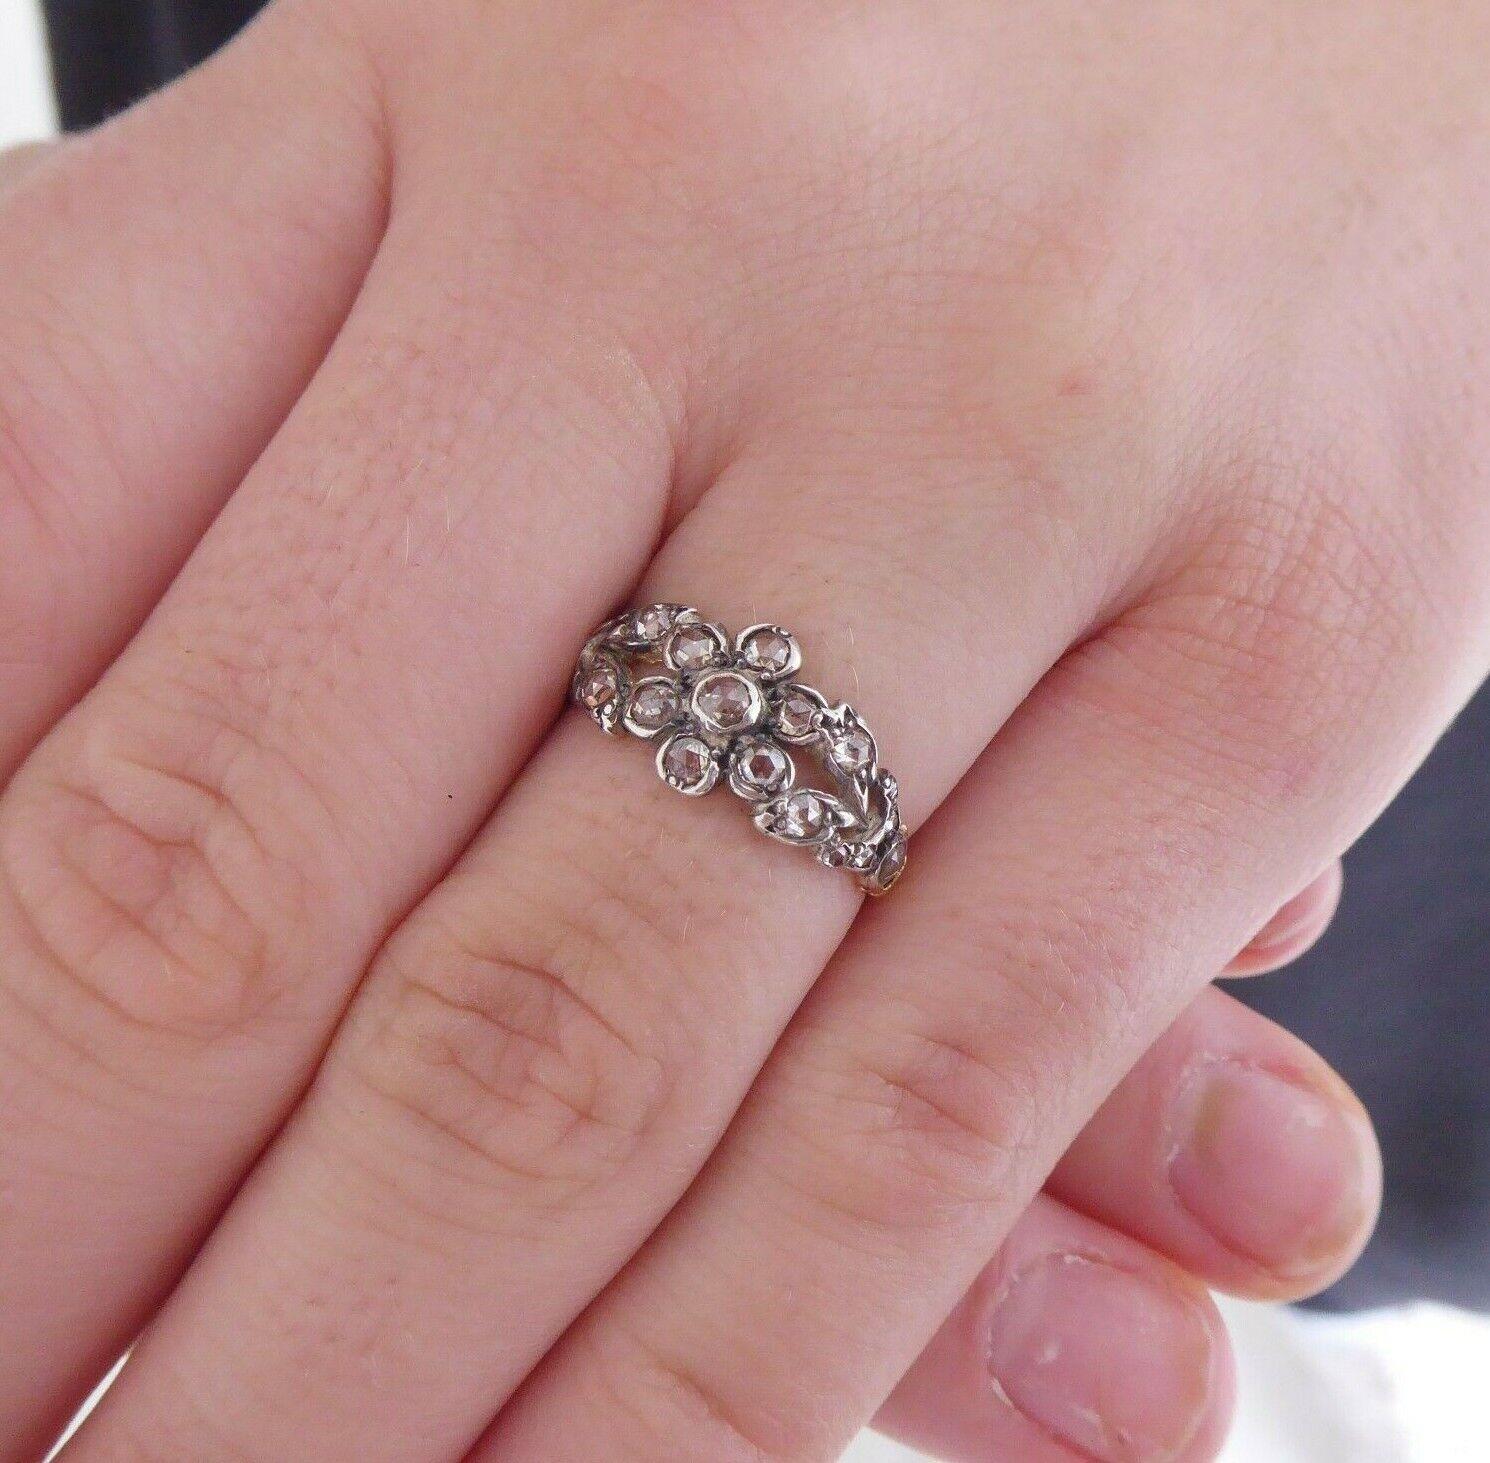 18ct gold rose cut diamond ring, Georgian